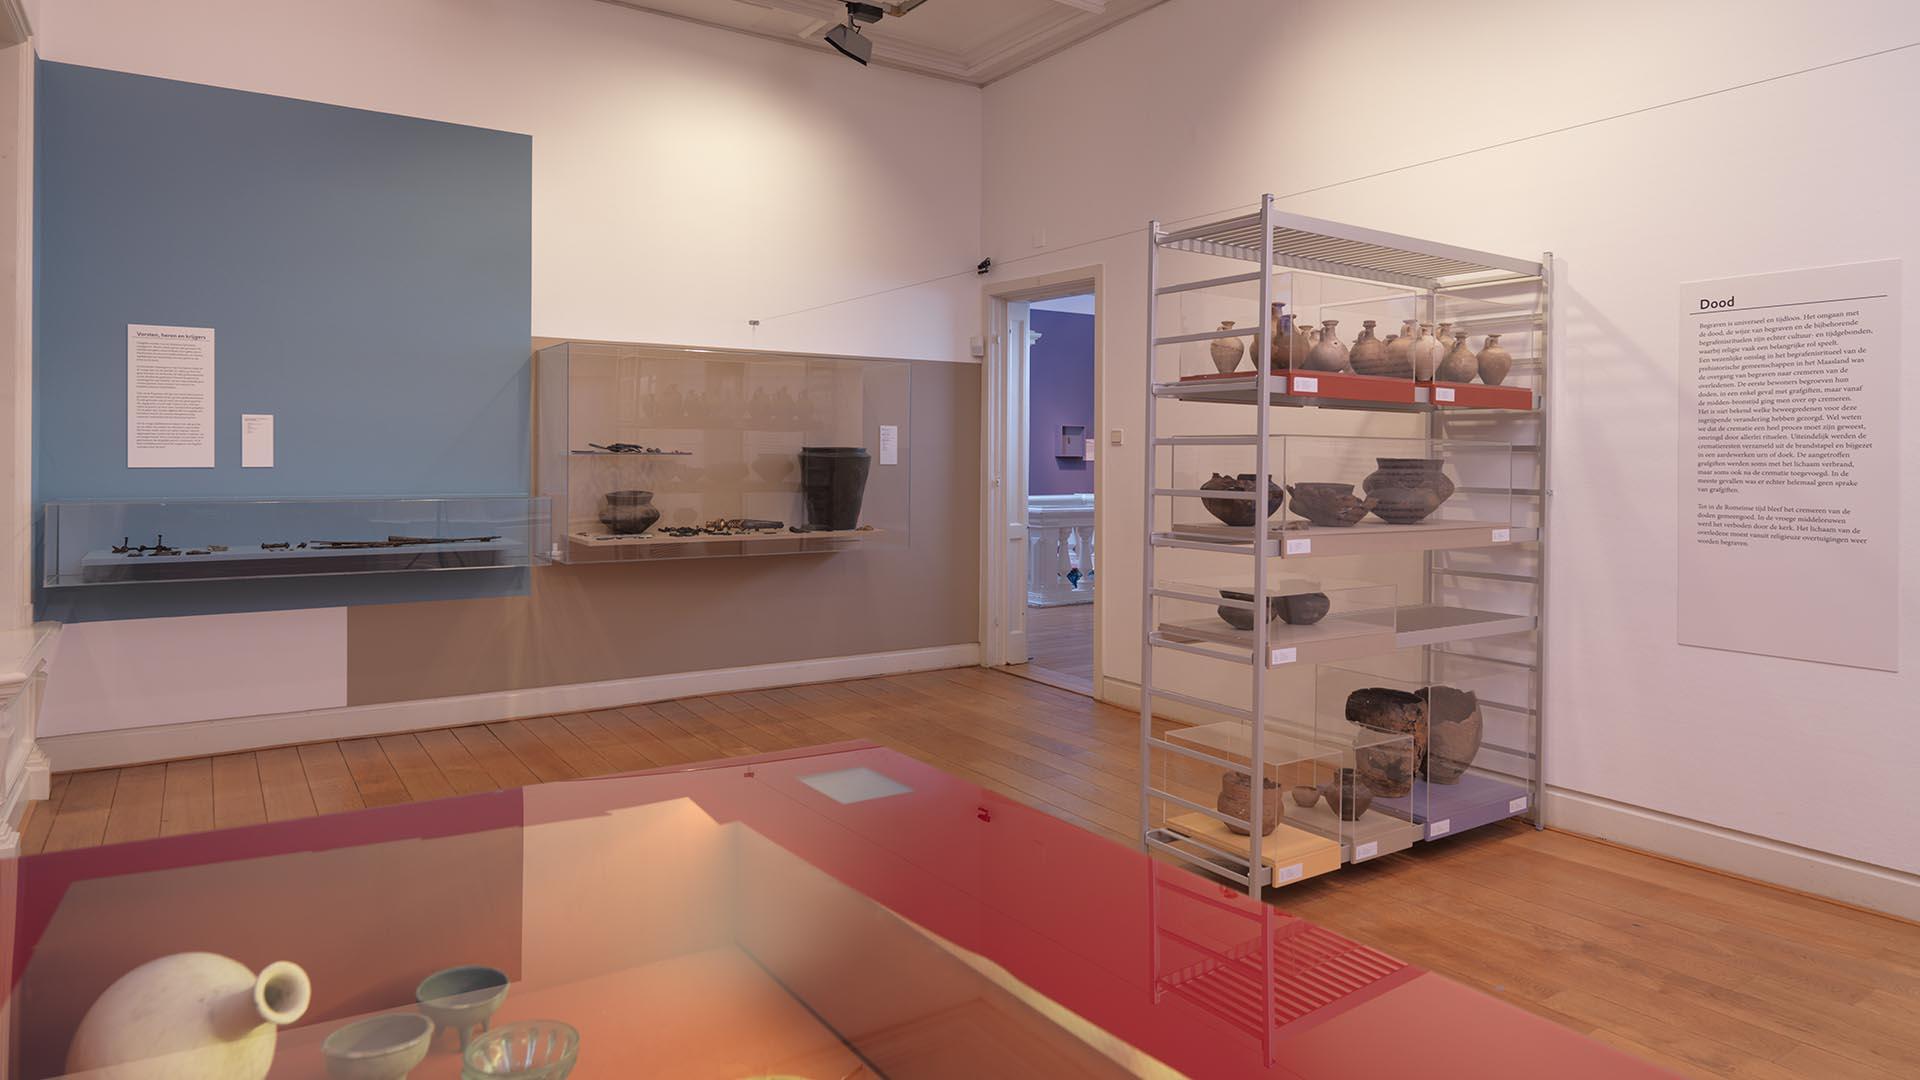 Romeinen Studio Public Museum Jan Tunen